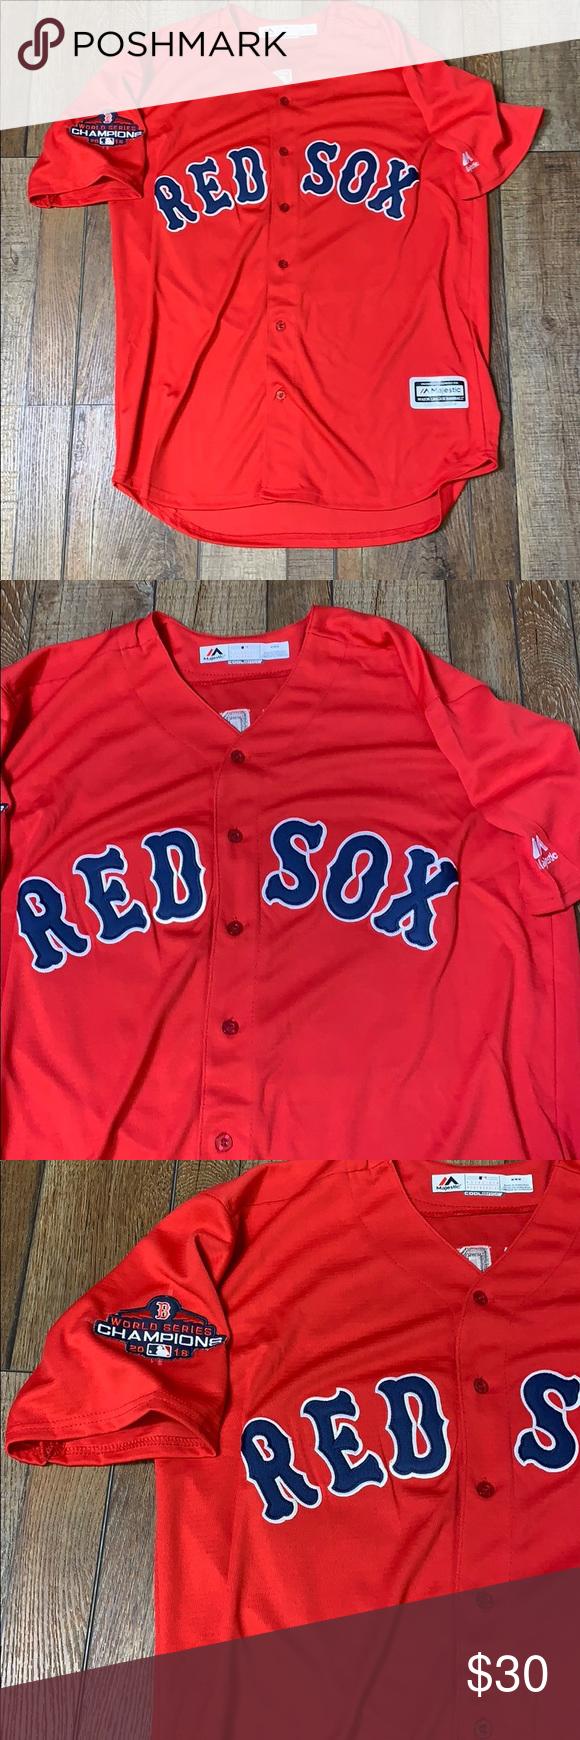 b1ffb47d7 JD Martinez Boston Red Sox World Series Jersey Men's Size Medium Authentic Majestic  Cool Base Jersey